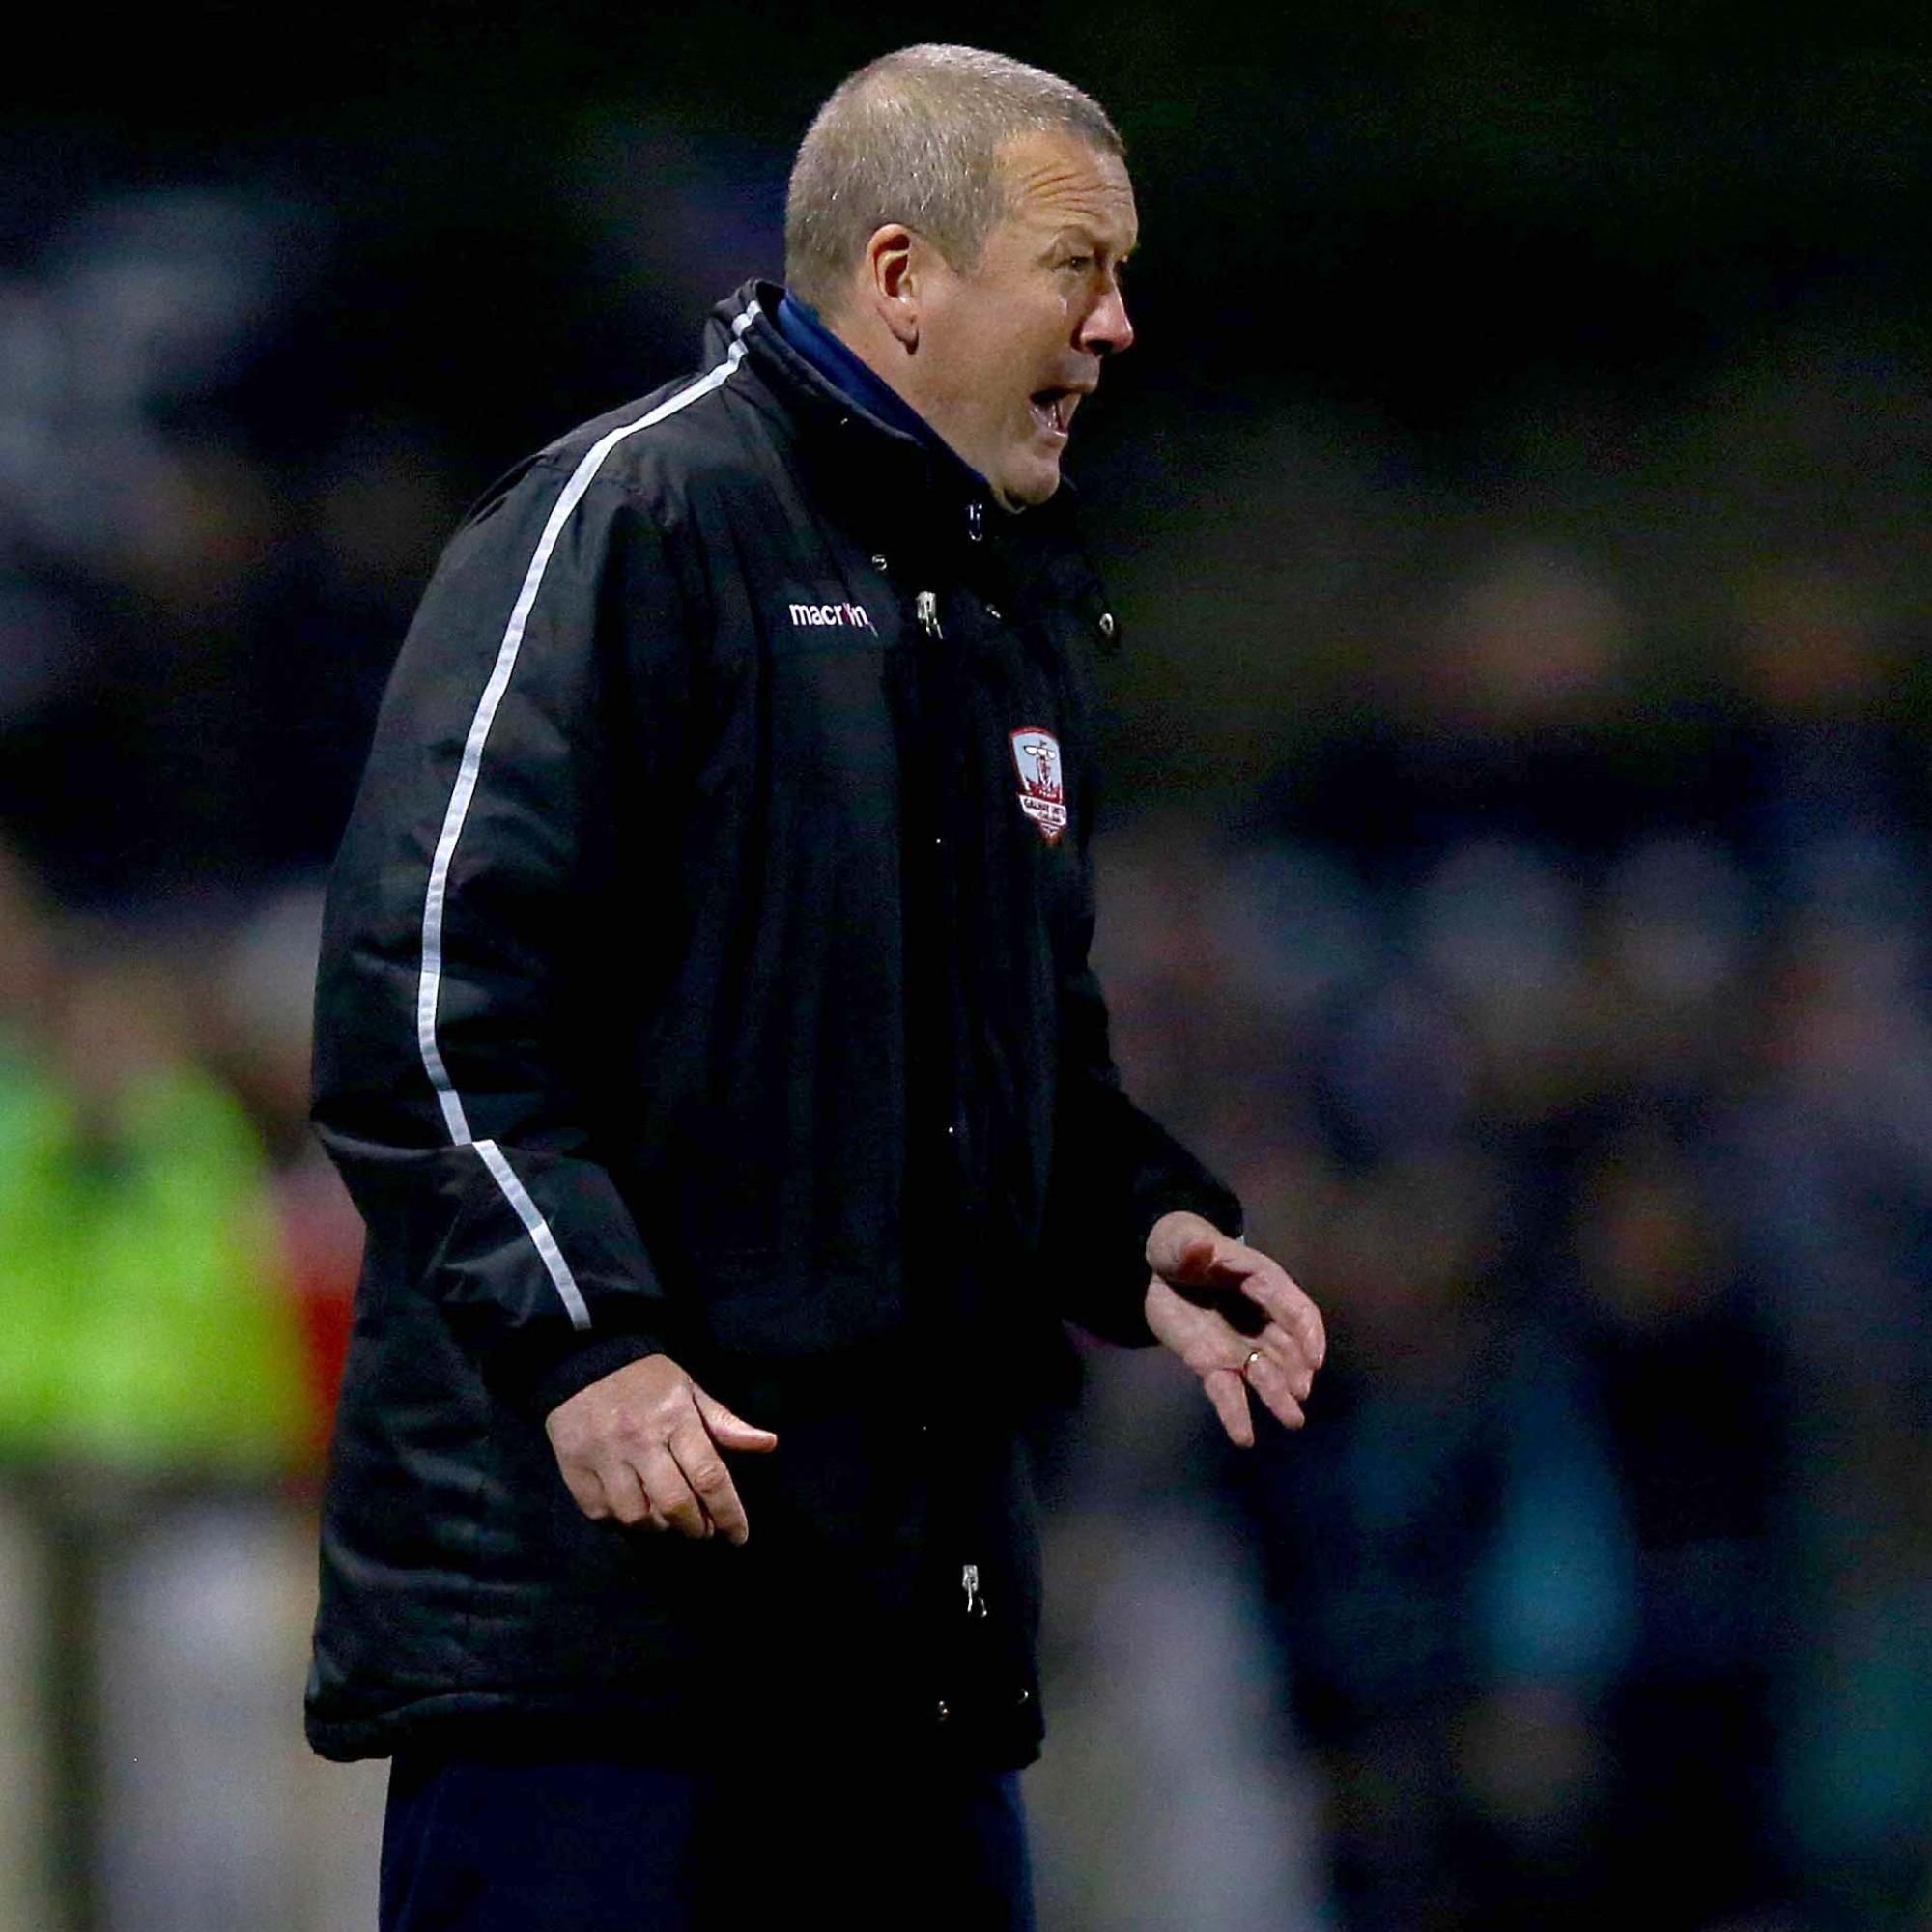 On-loan Premier League striker the hero as Galway let two-goal lead slip